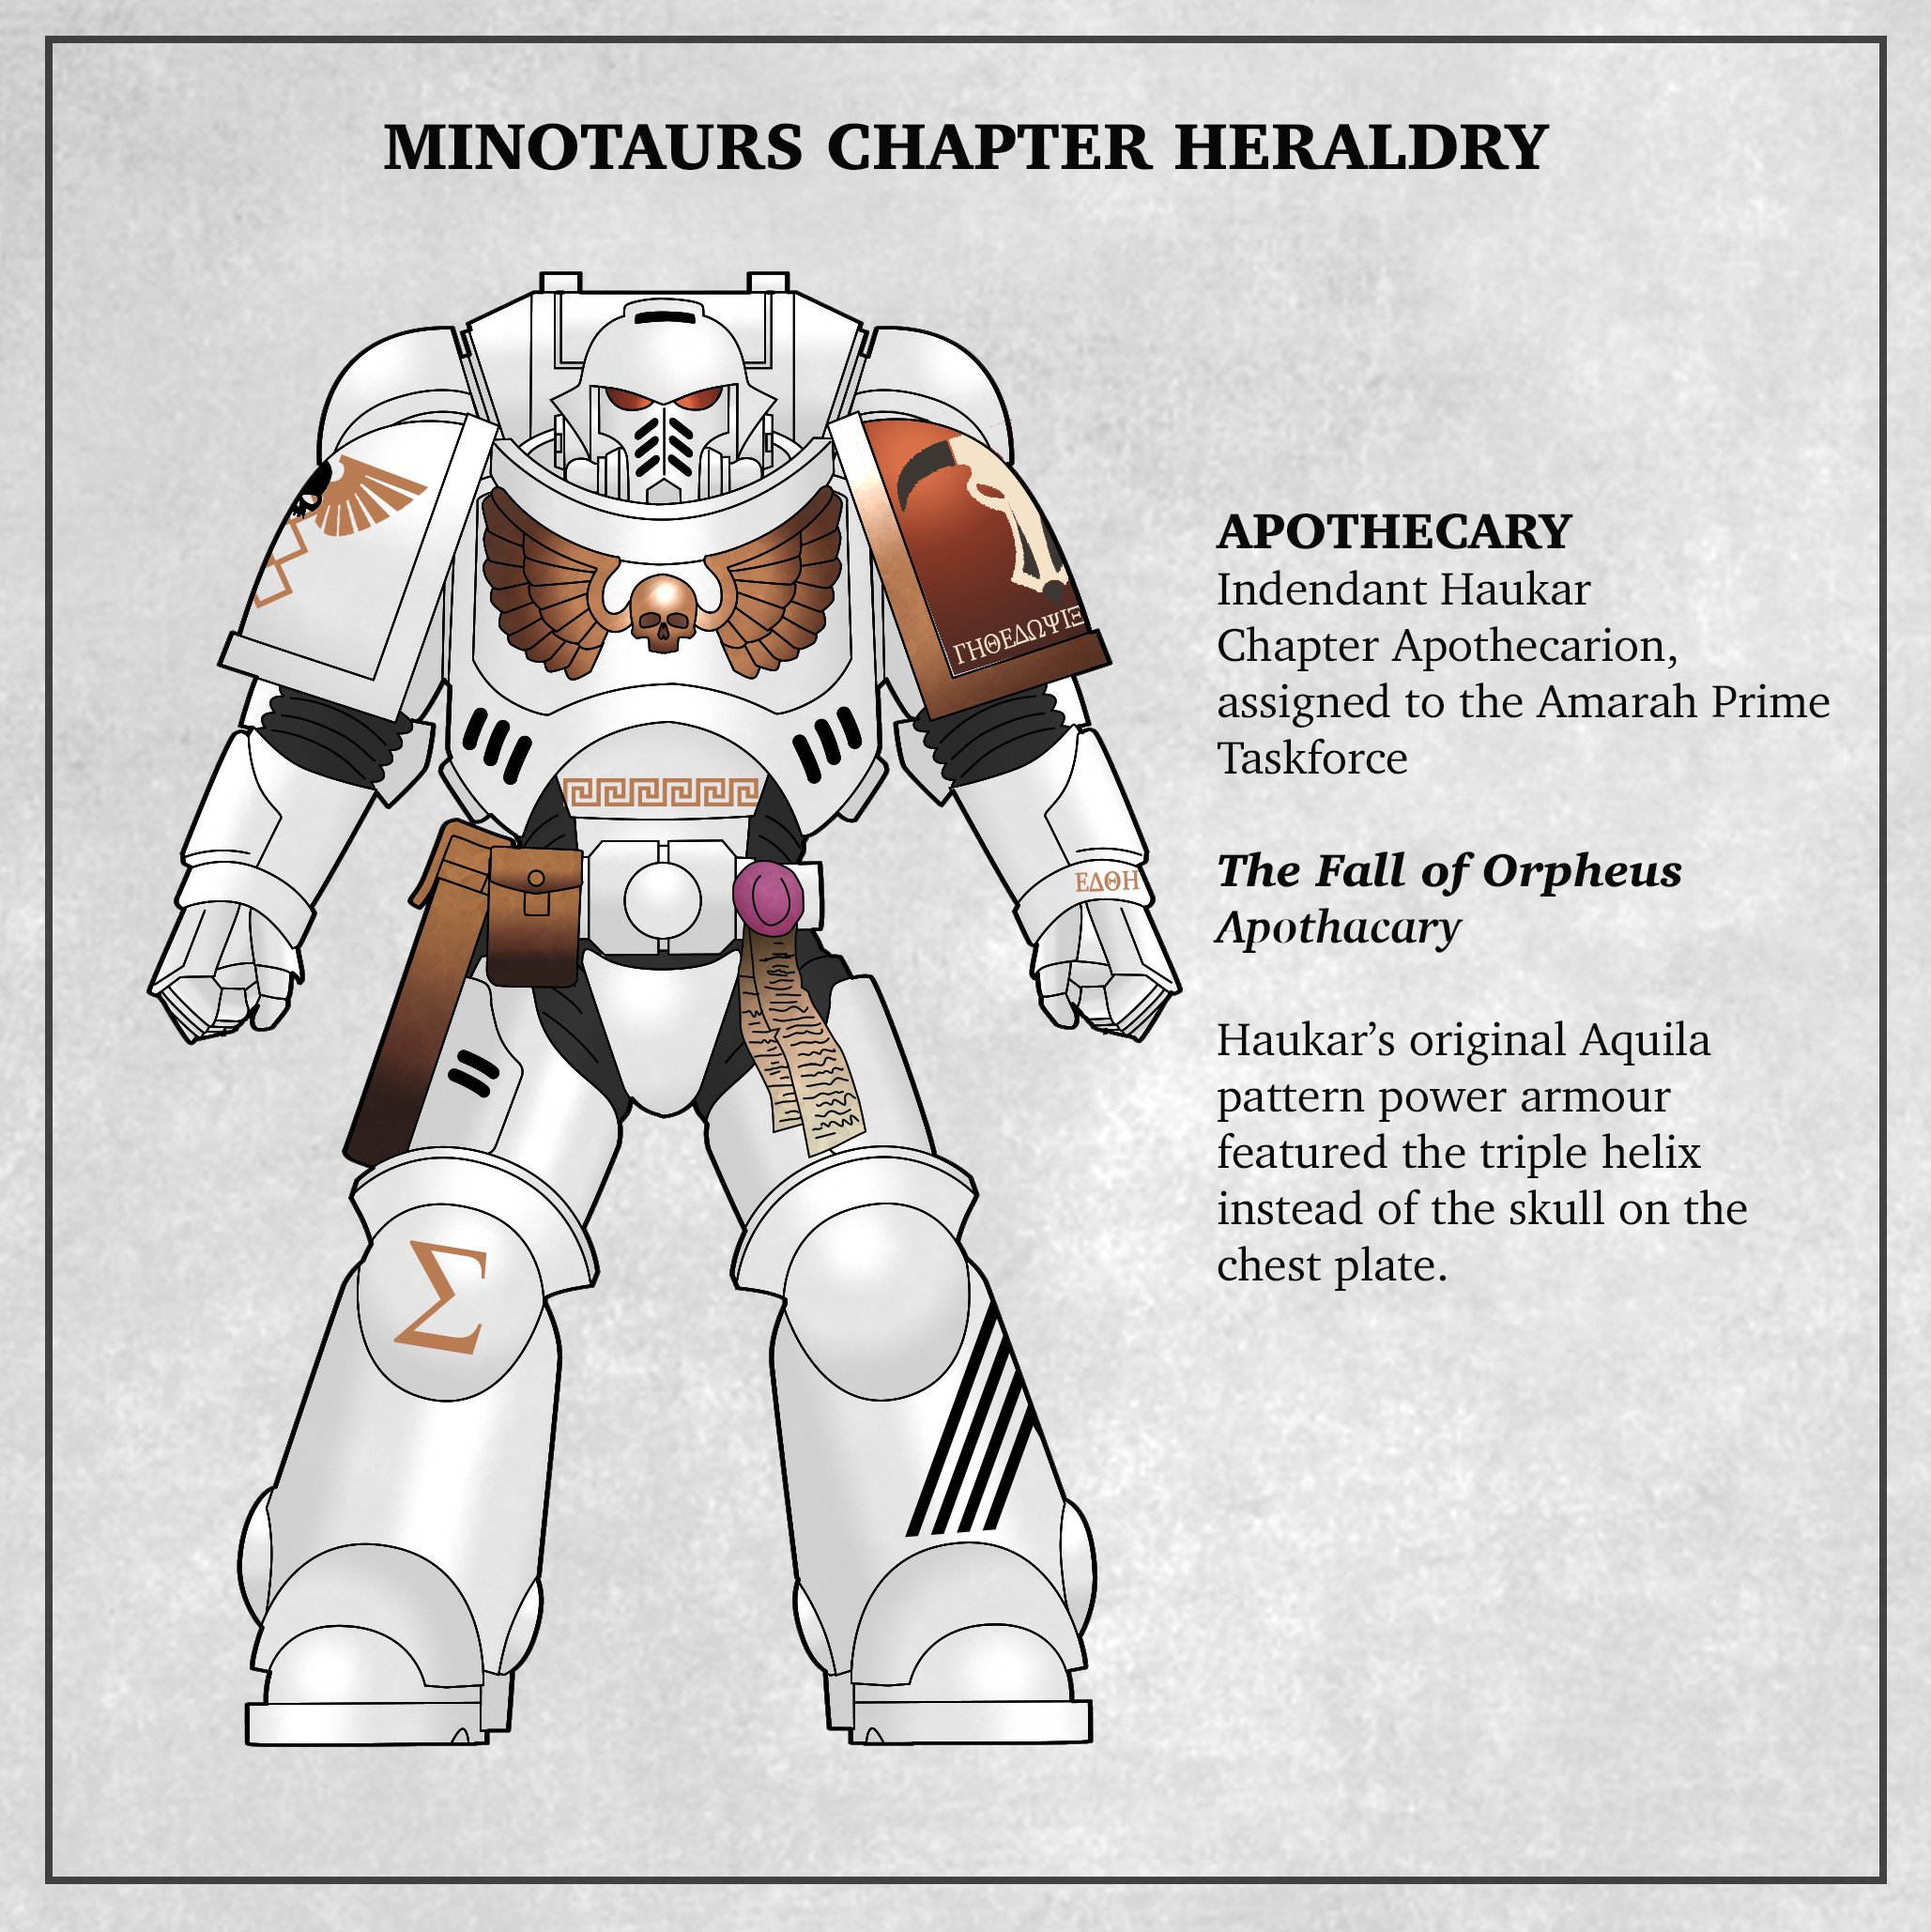 Minotaurs Apothacary Fall of Orpheus